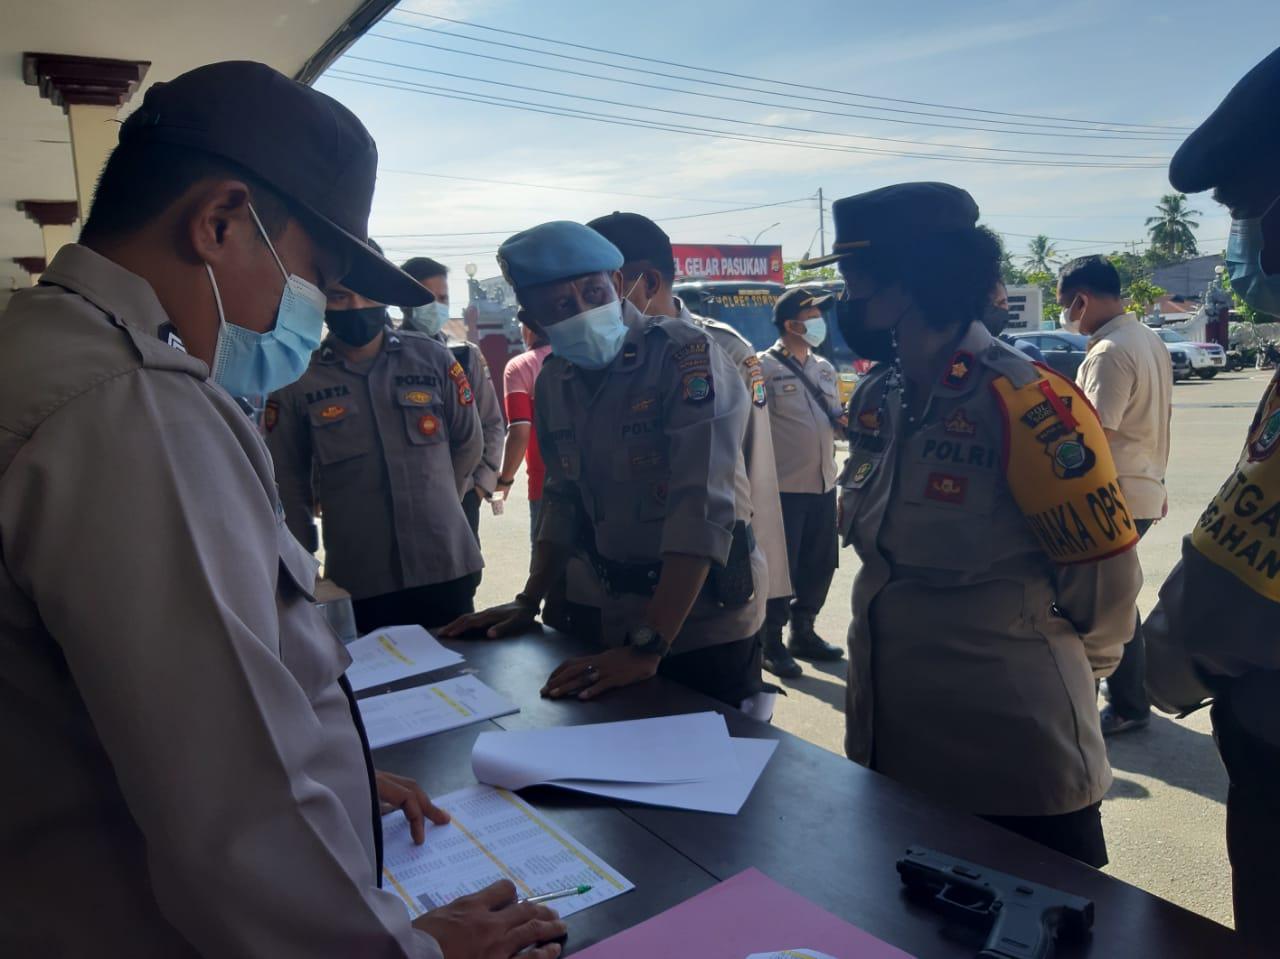 Antisipasi Penyalagunaan Senpi, Waka Polres Sorong pimpin Pengecekan dan pemeriksaan Senpi Organik